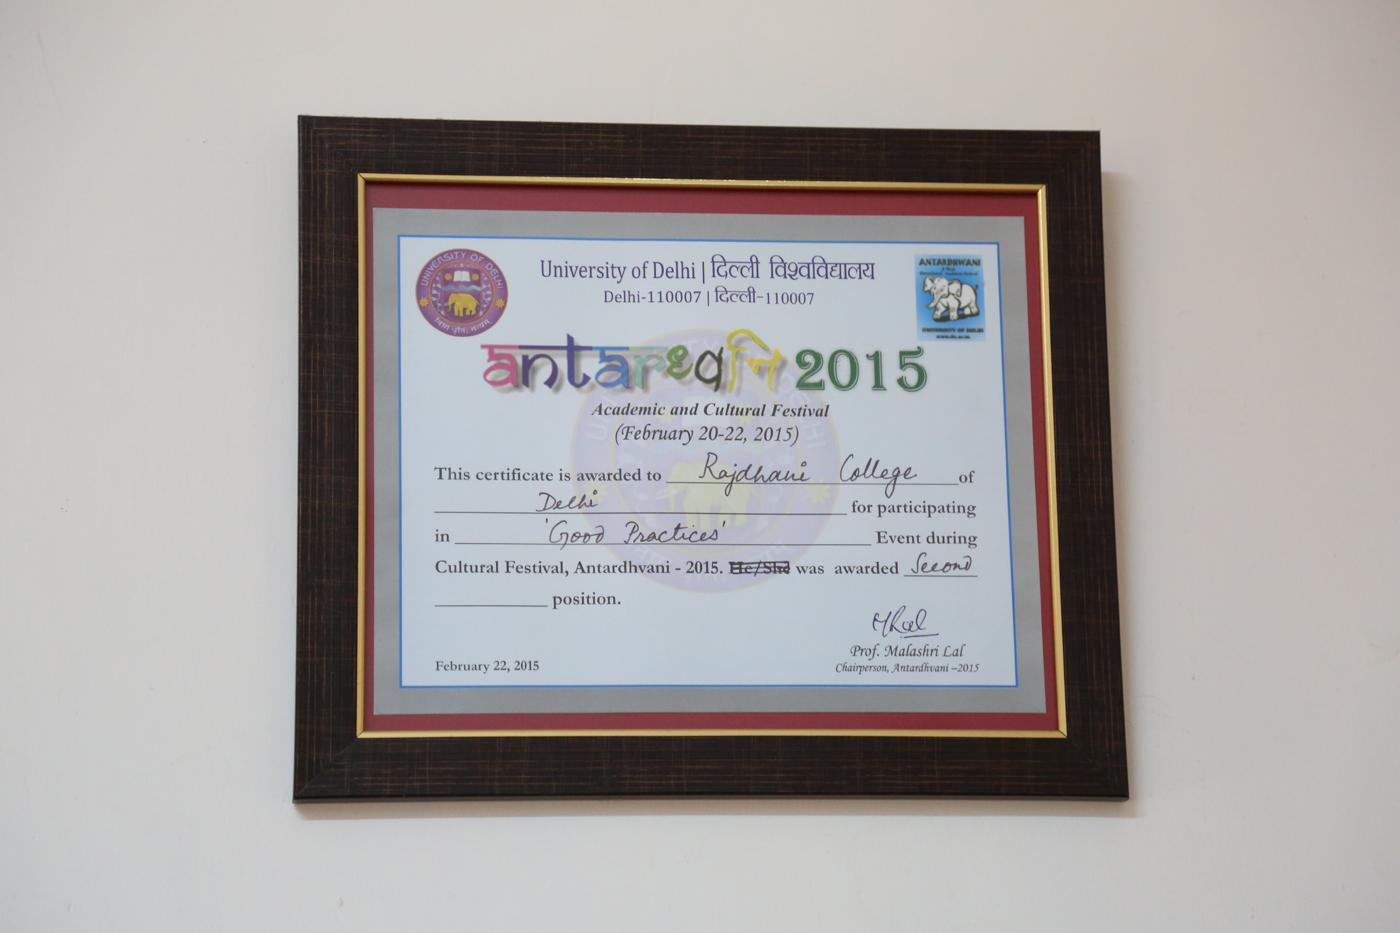 Antardhvani IInd Prize